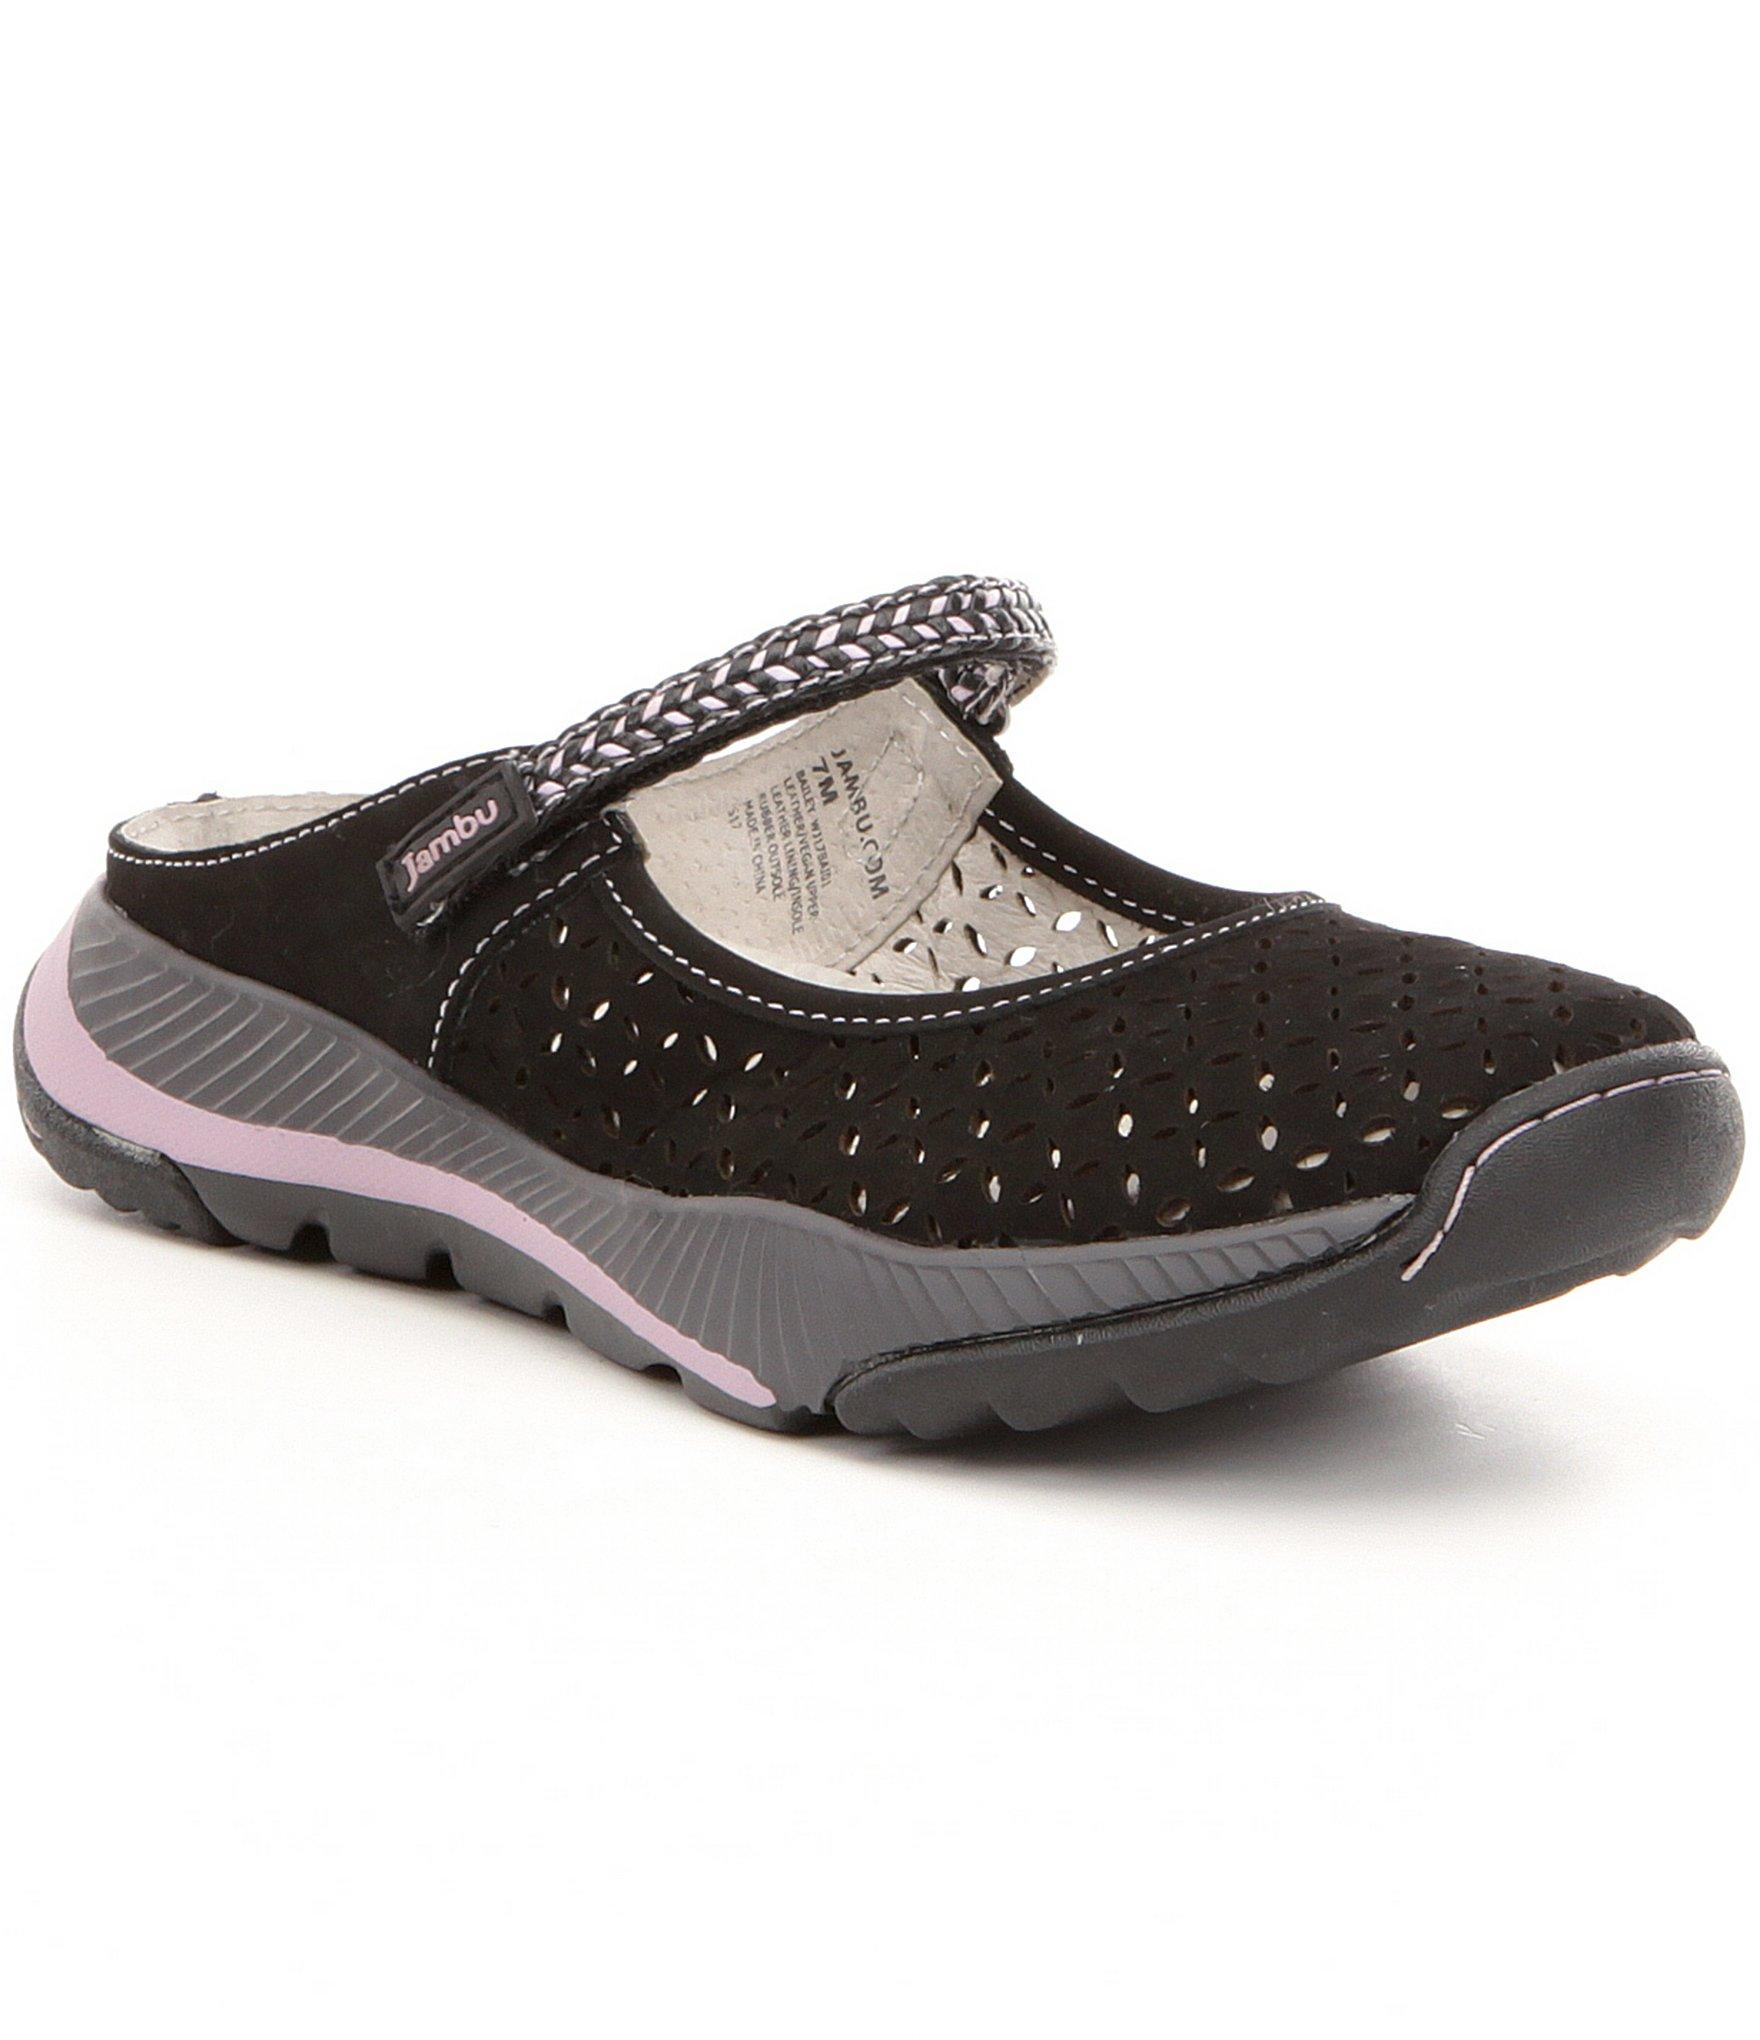 Jambu Bailey Slip On Shoes